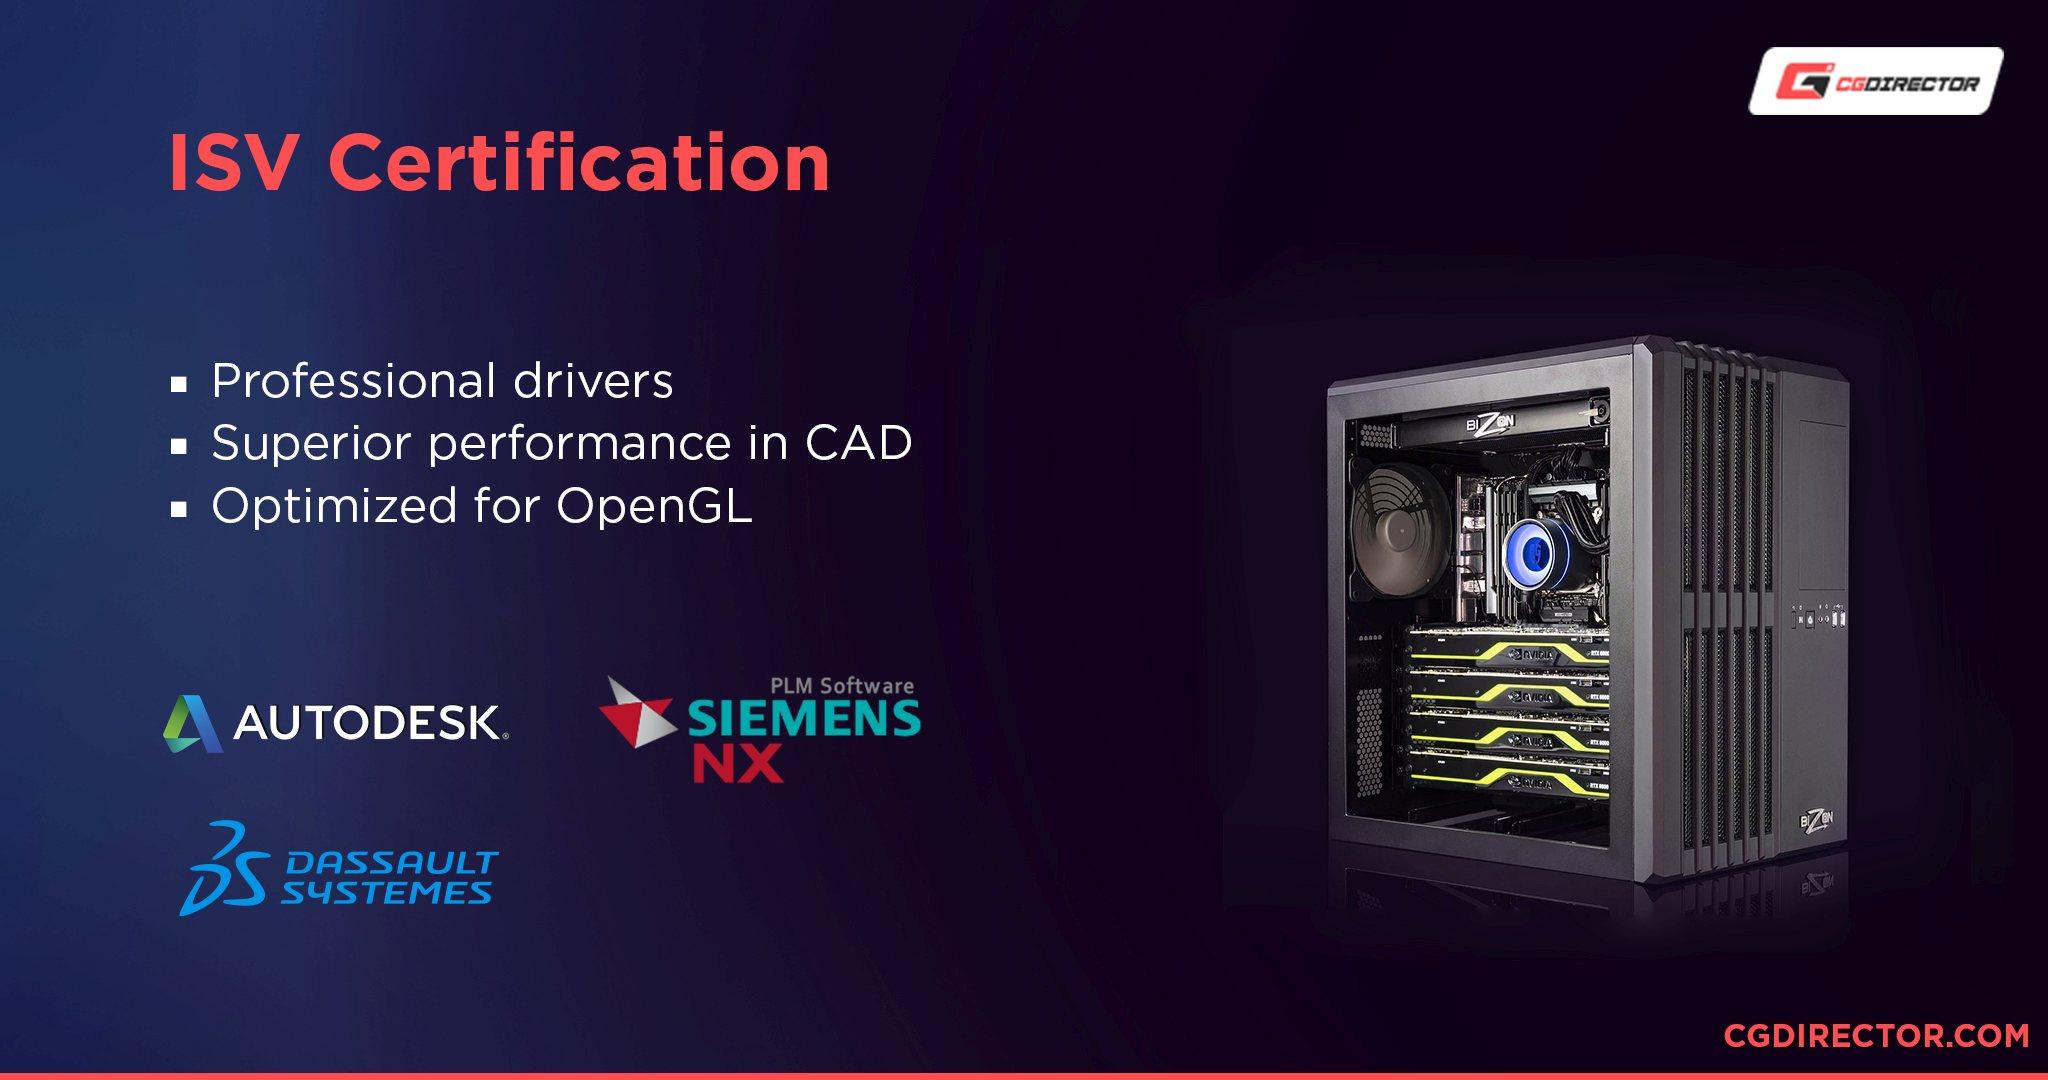 ISV Certification